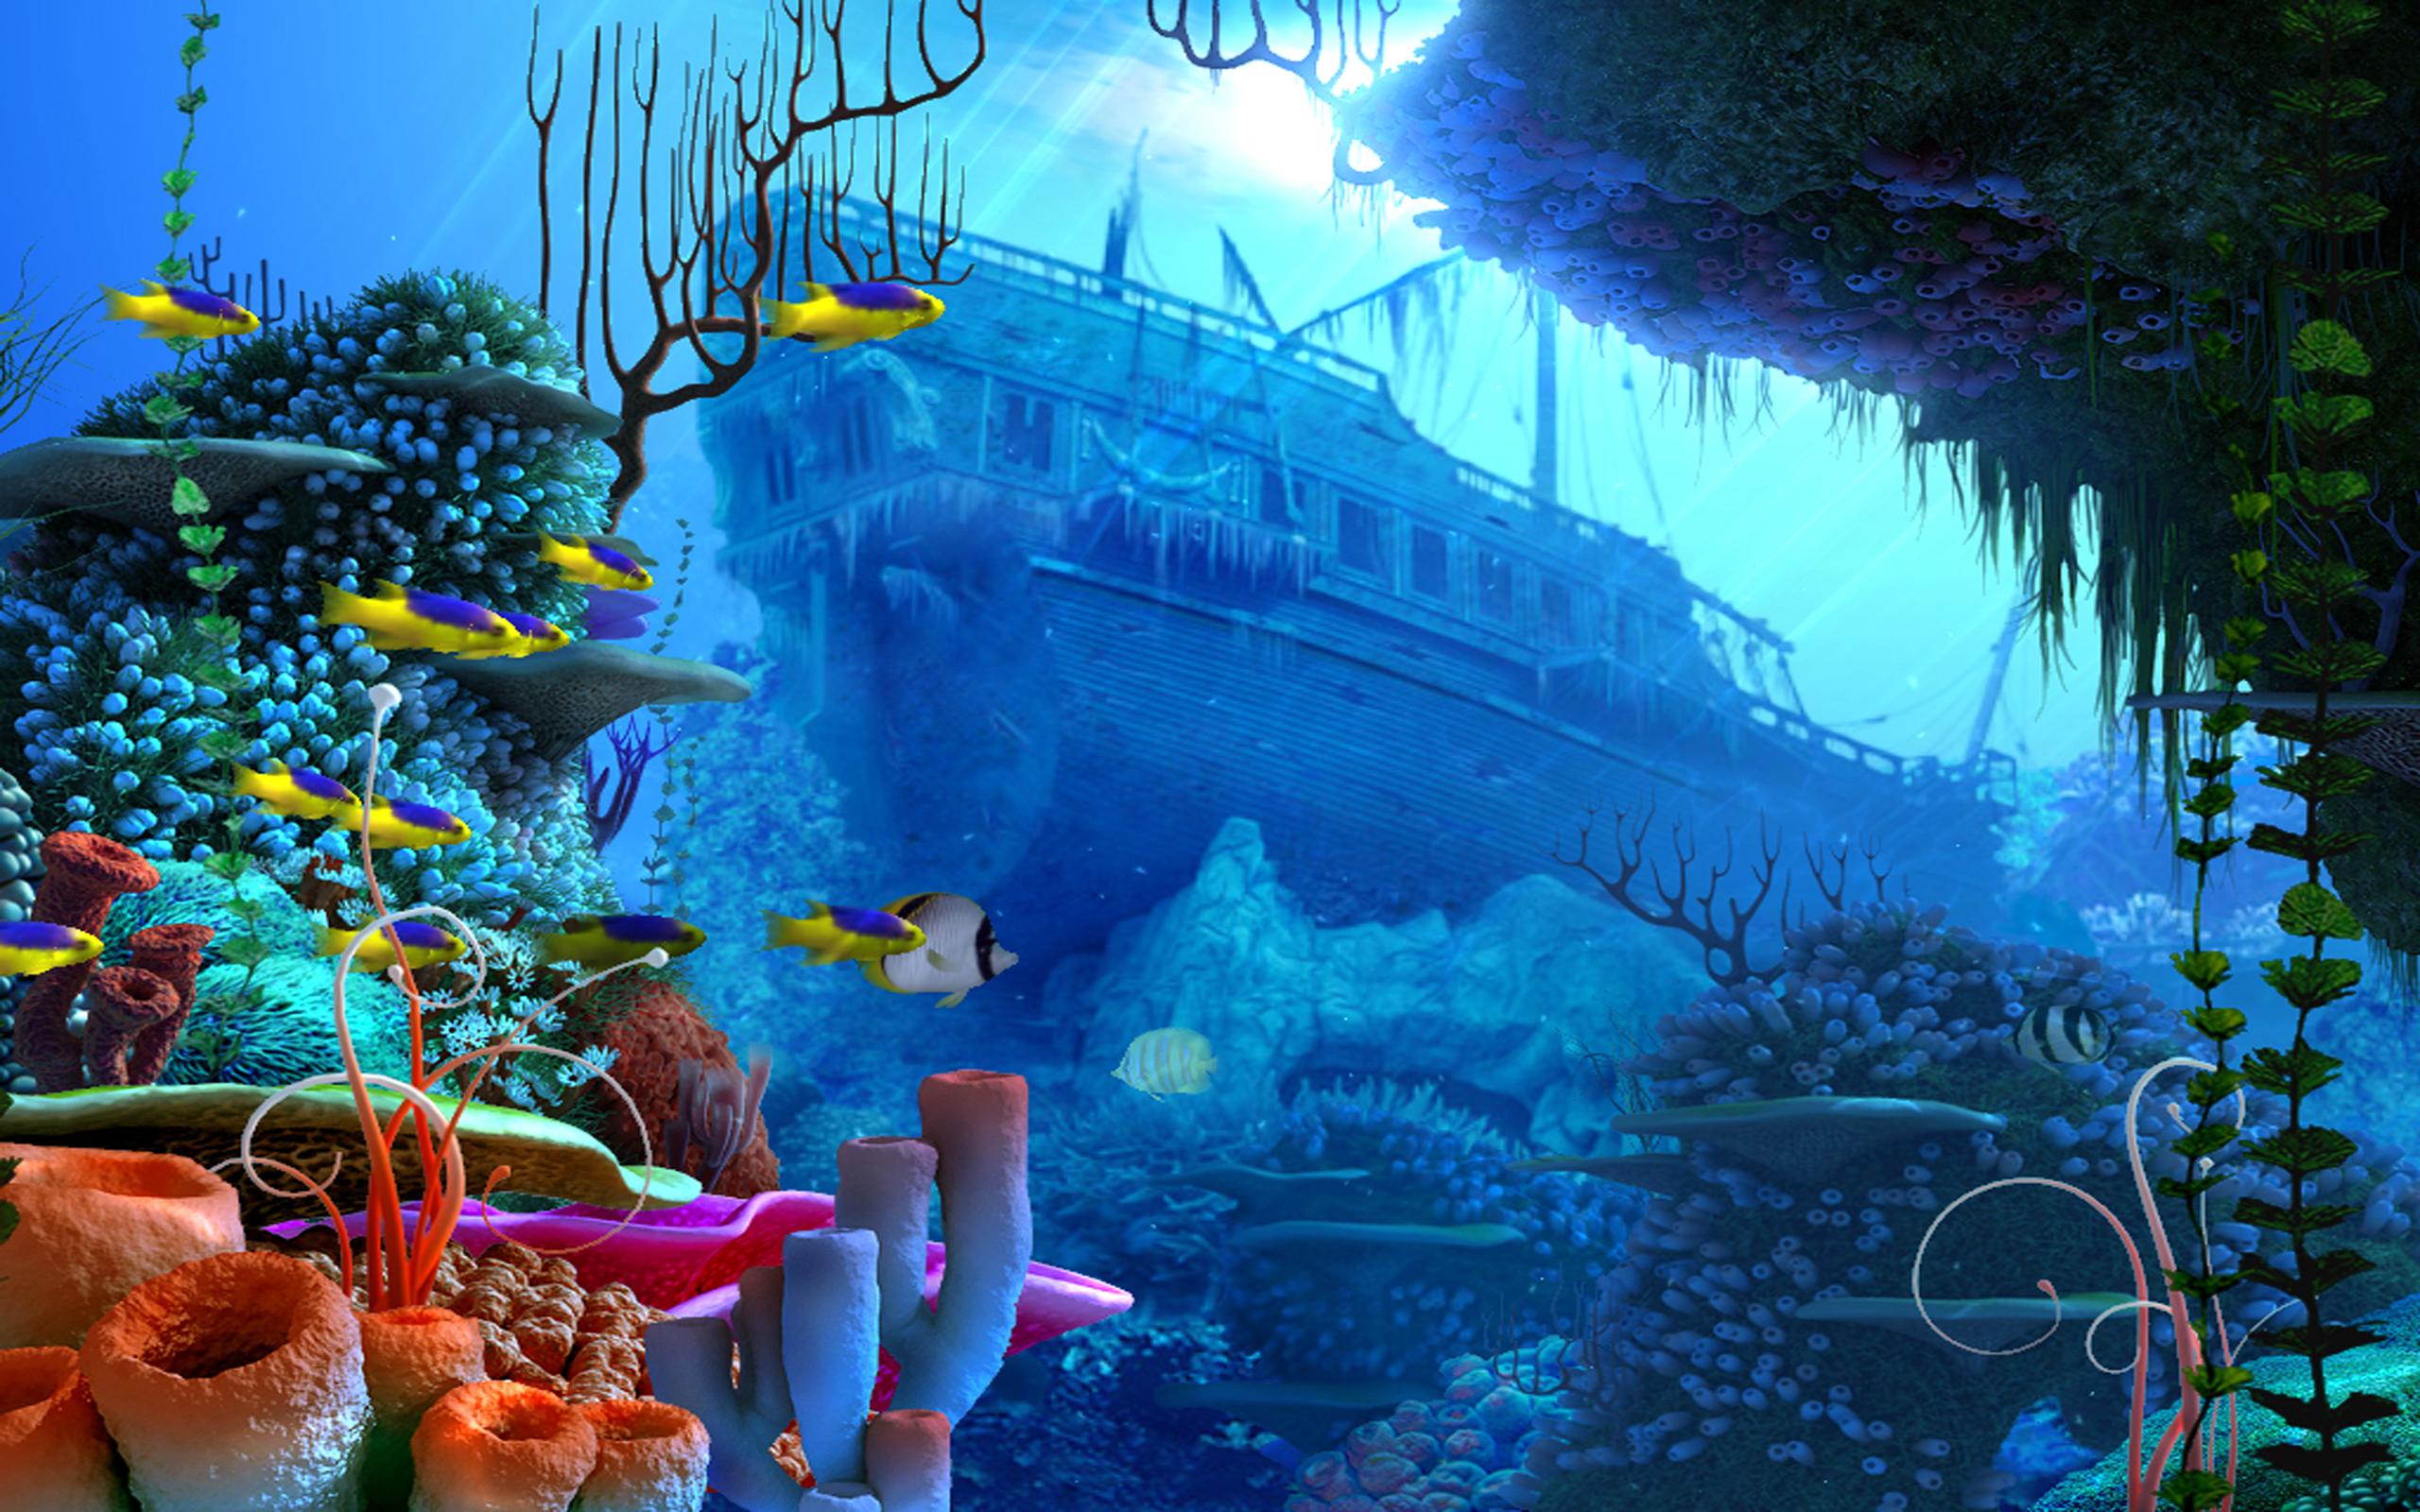 Pirates Pirate Fantasy Ship Fish Ocean Underwater